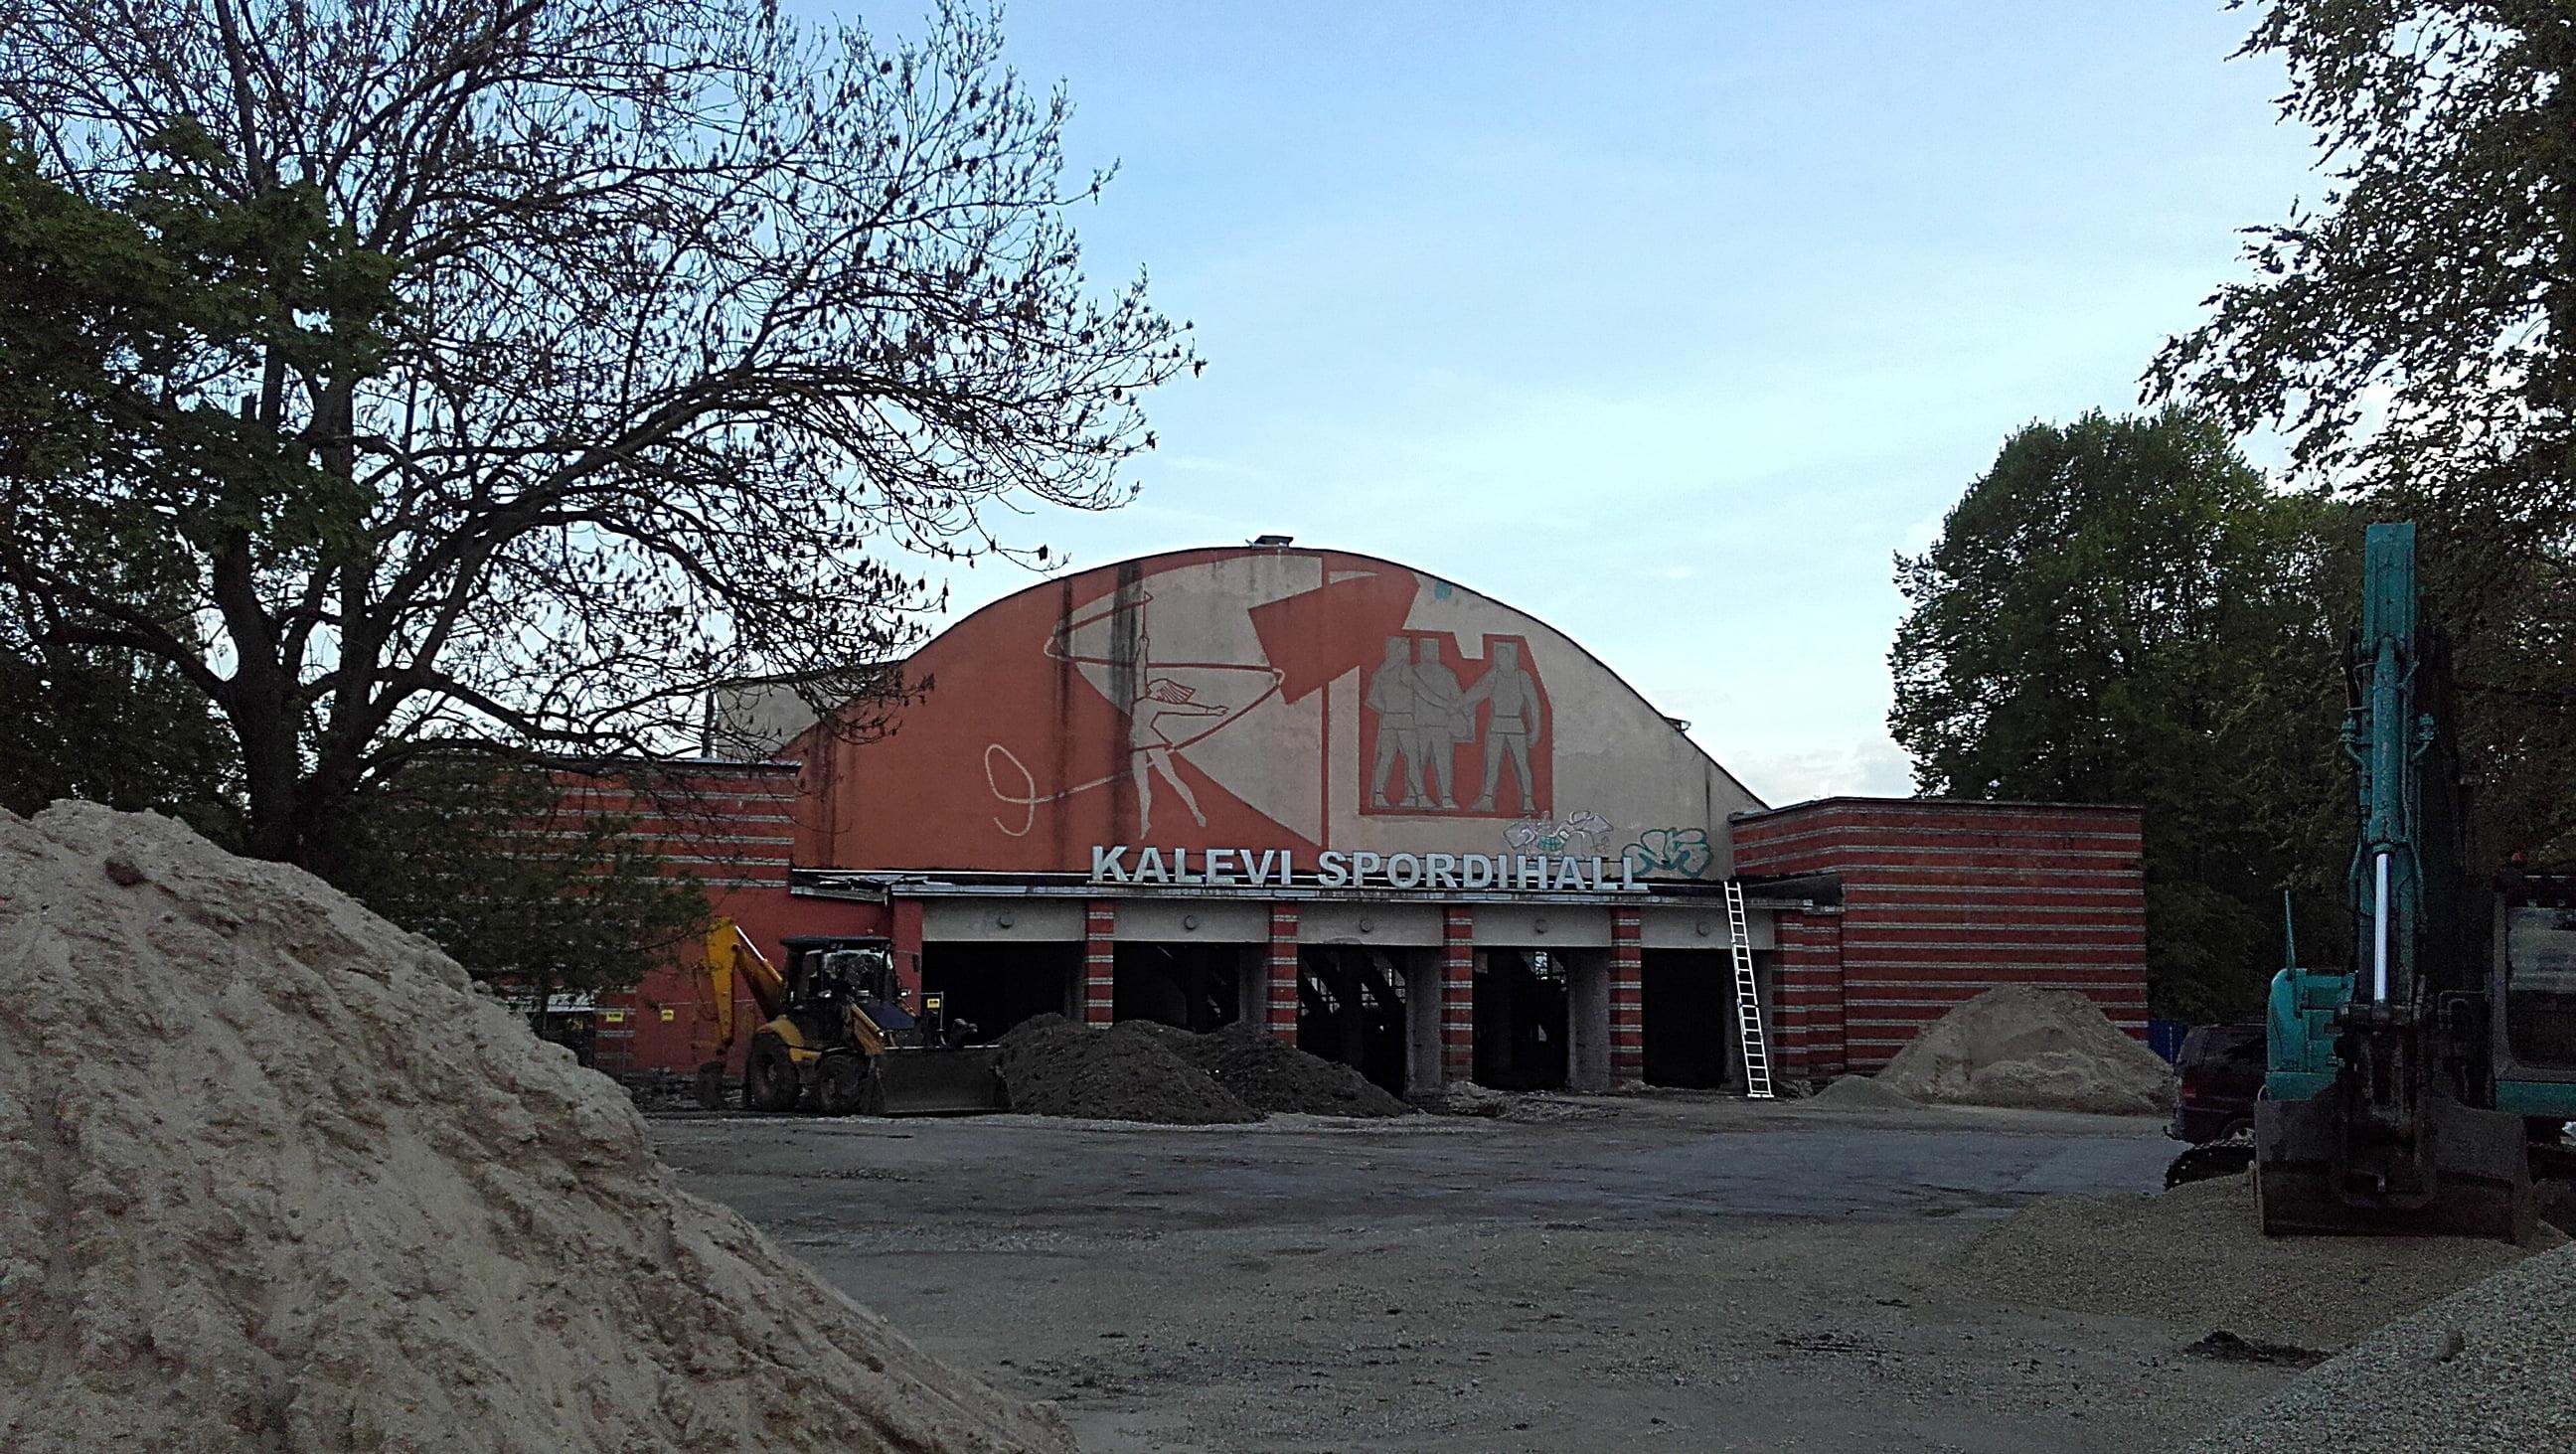 Kalevi sportshall in Tallinn, Estonia under renovation. Seen during my travel day one.